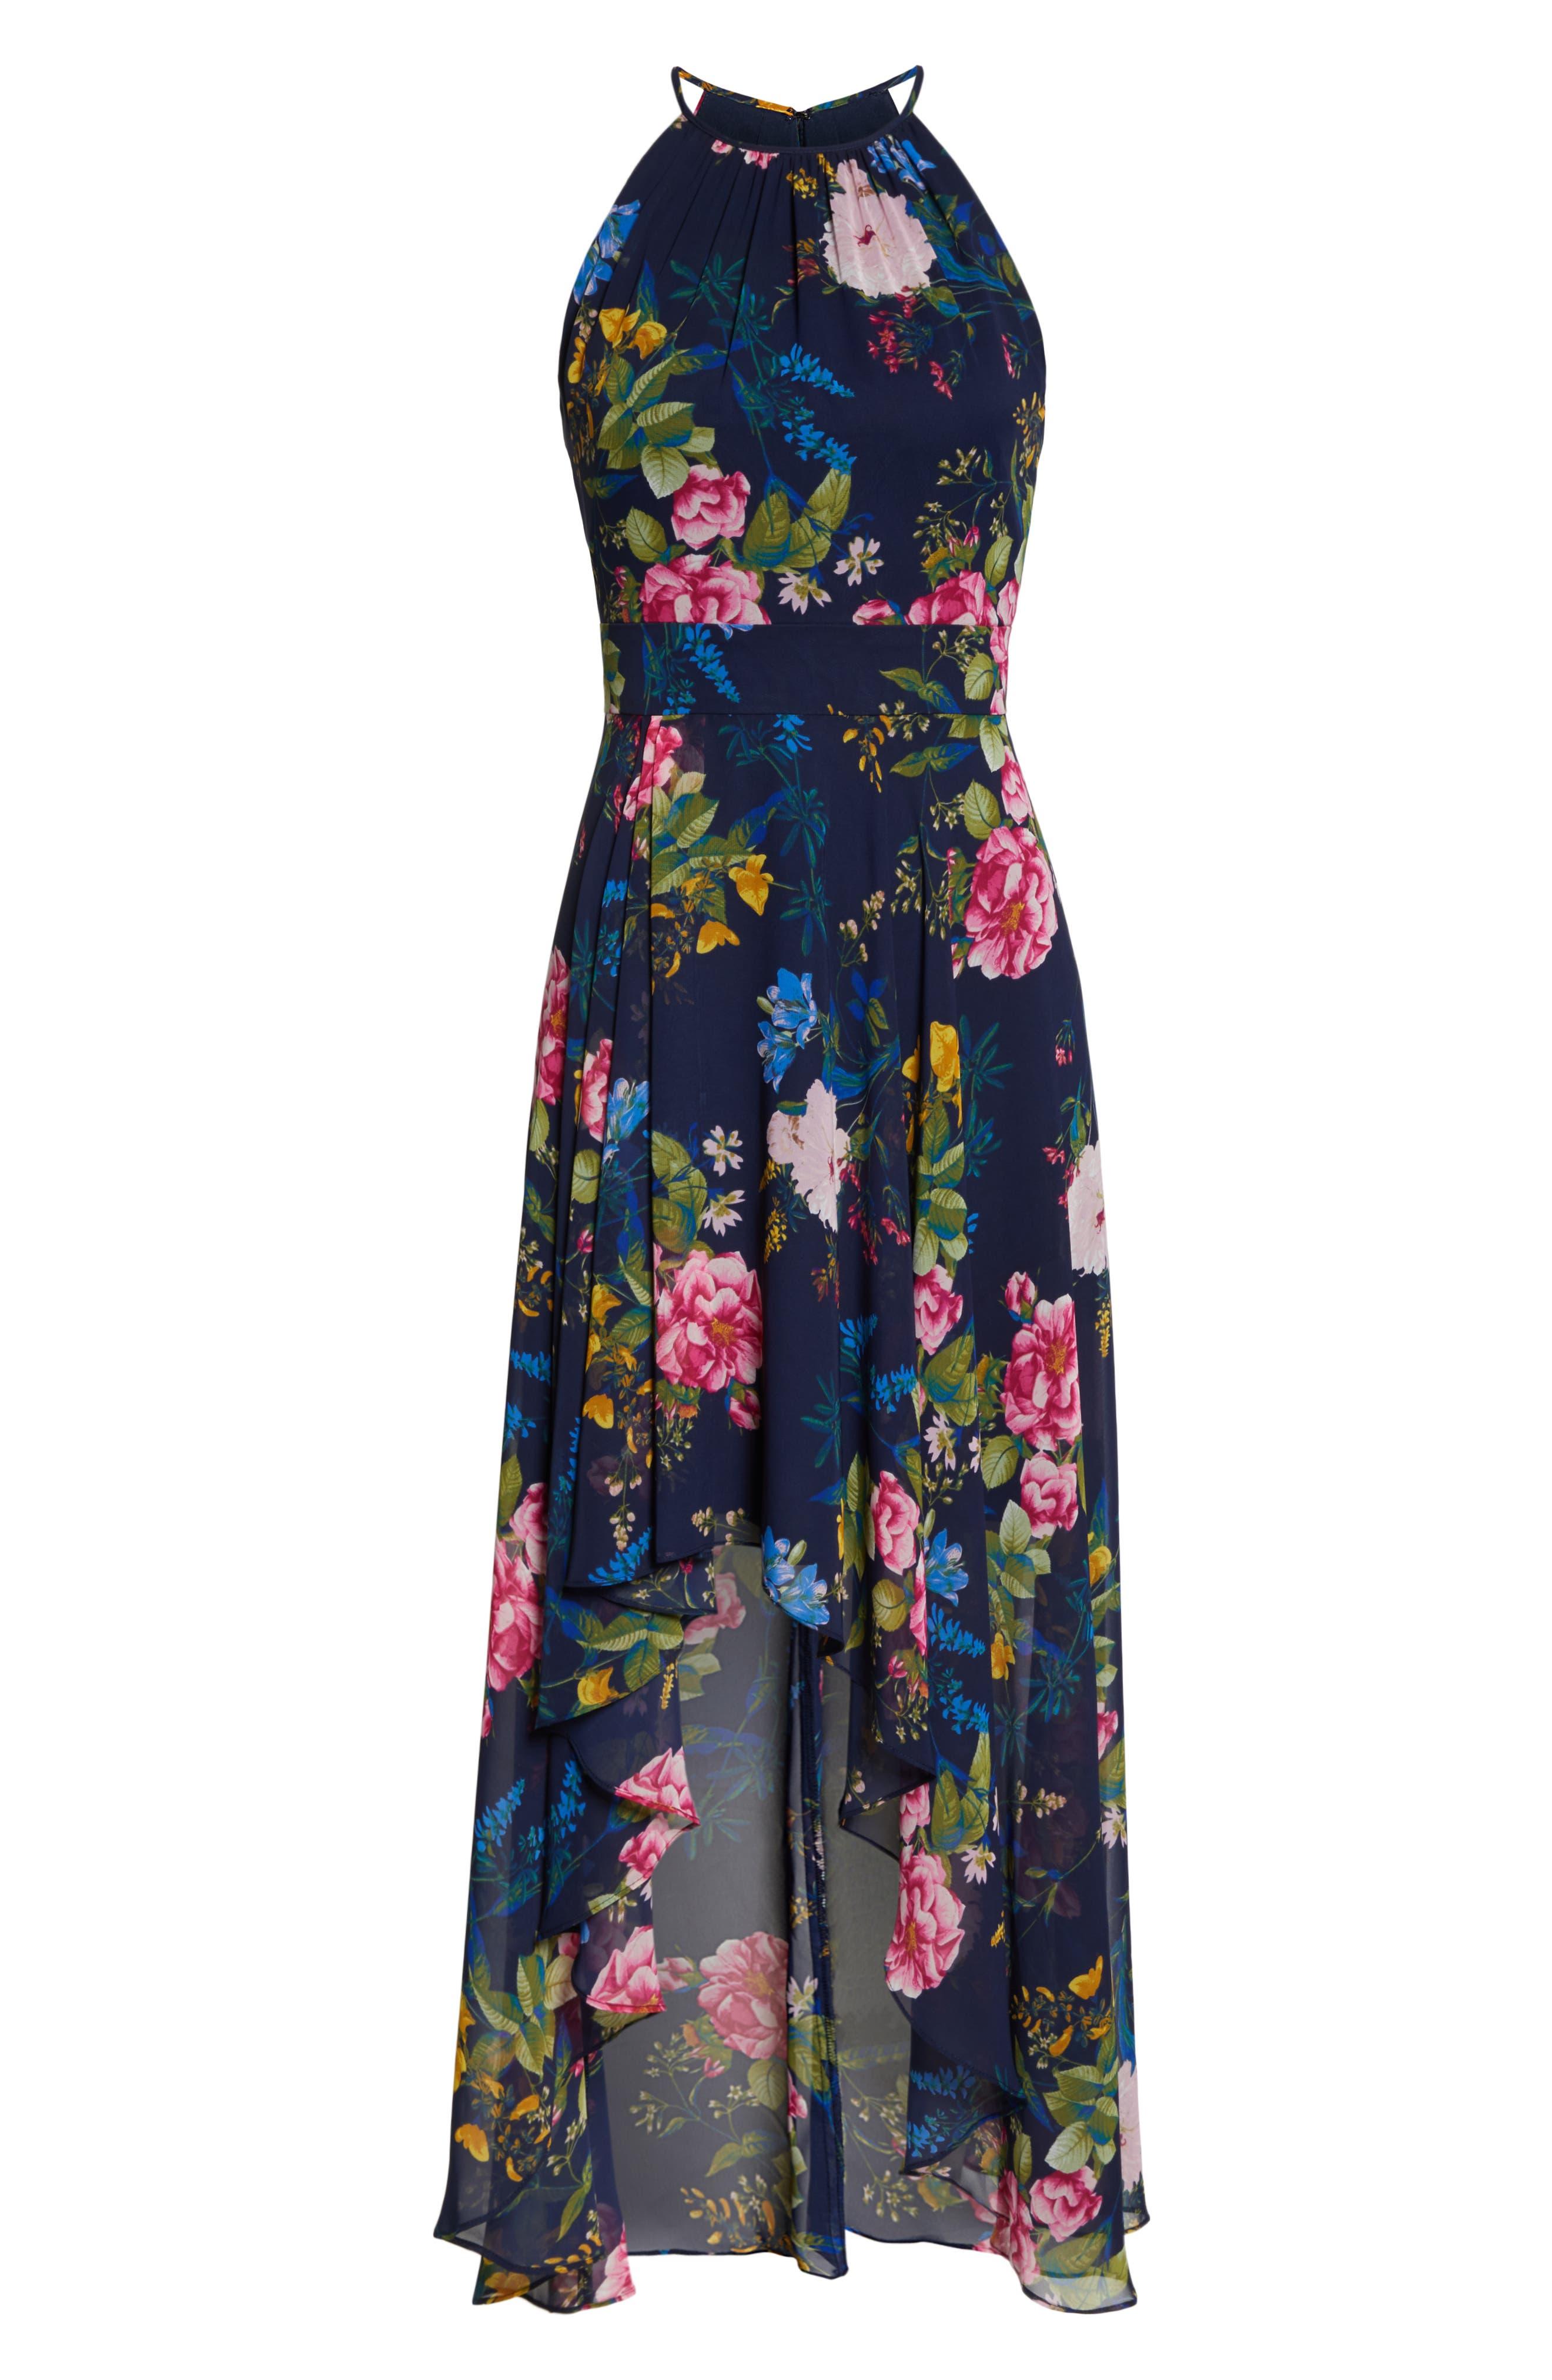 ELIZA J, Floral Print Chiffon Halter Dress, Alternate thumbnail 7, color, NAVY